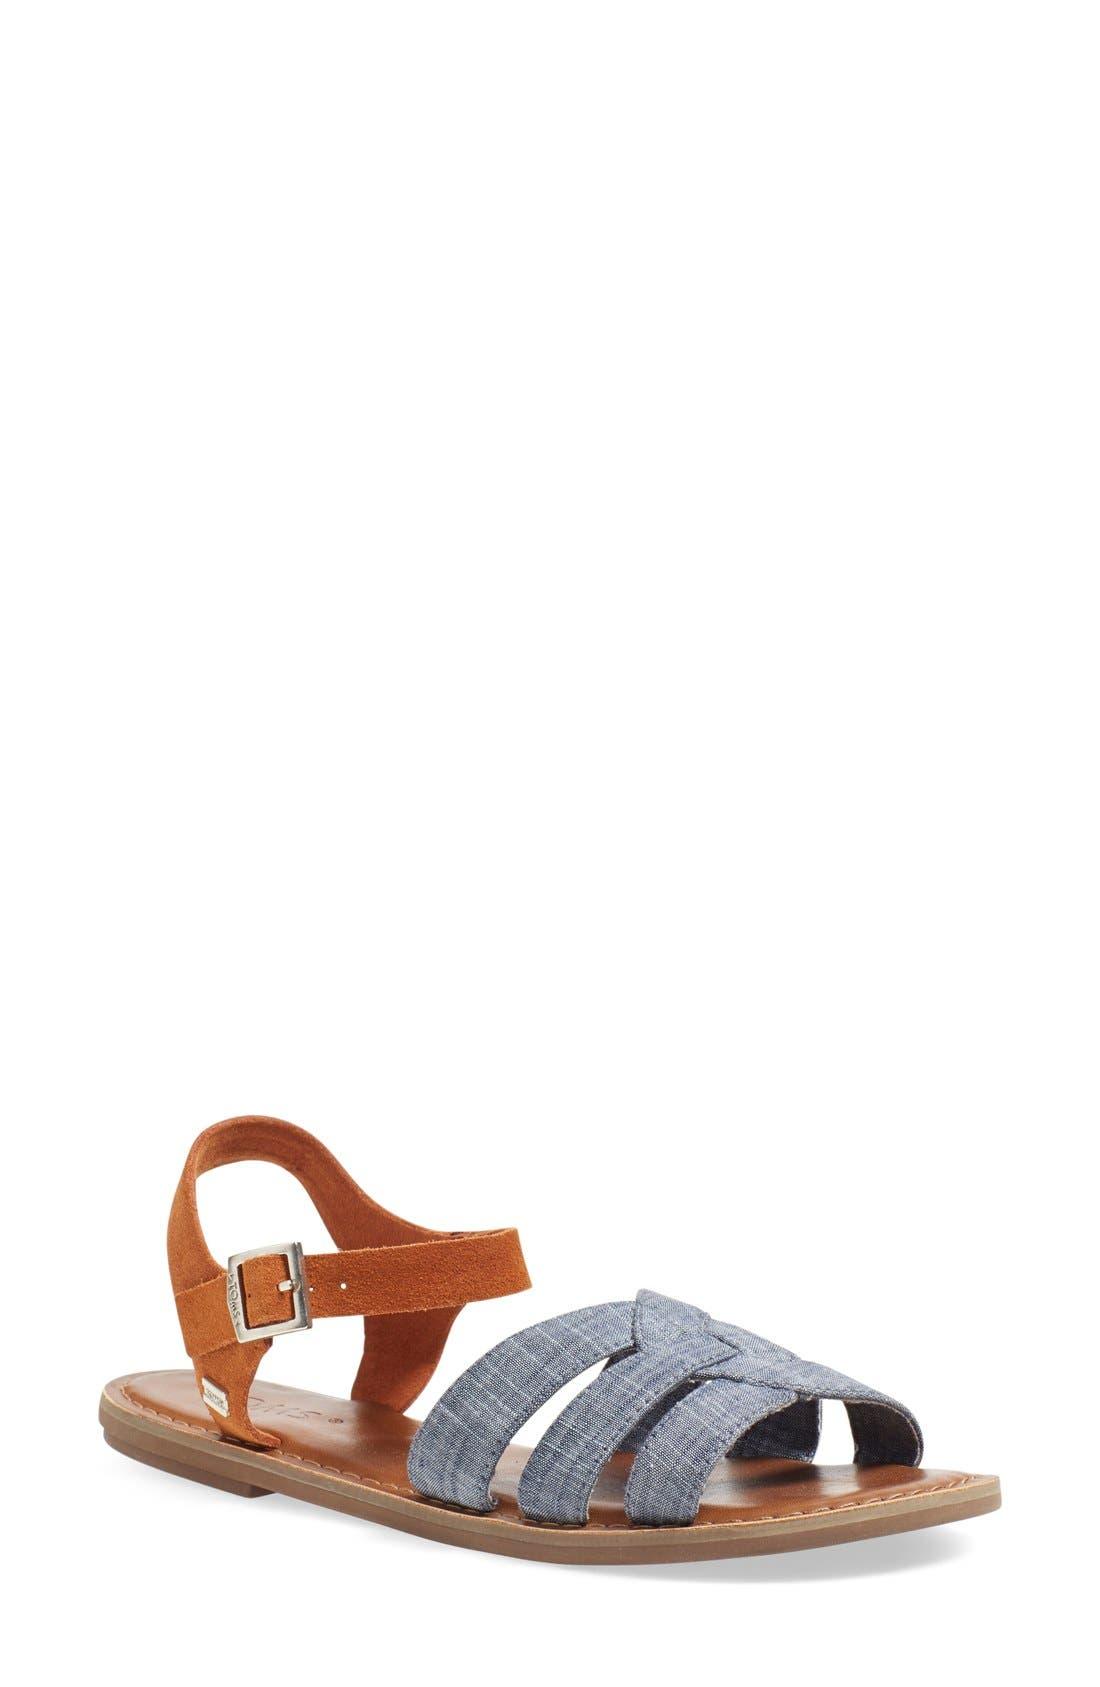 Main Image - TOMS 'Zoe' Chambray Flat Quarter Strap Sandal (Women)